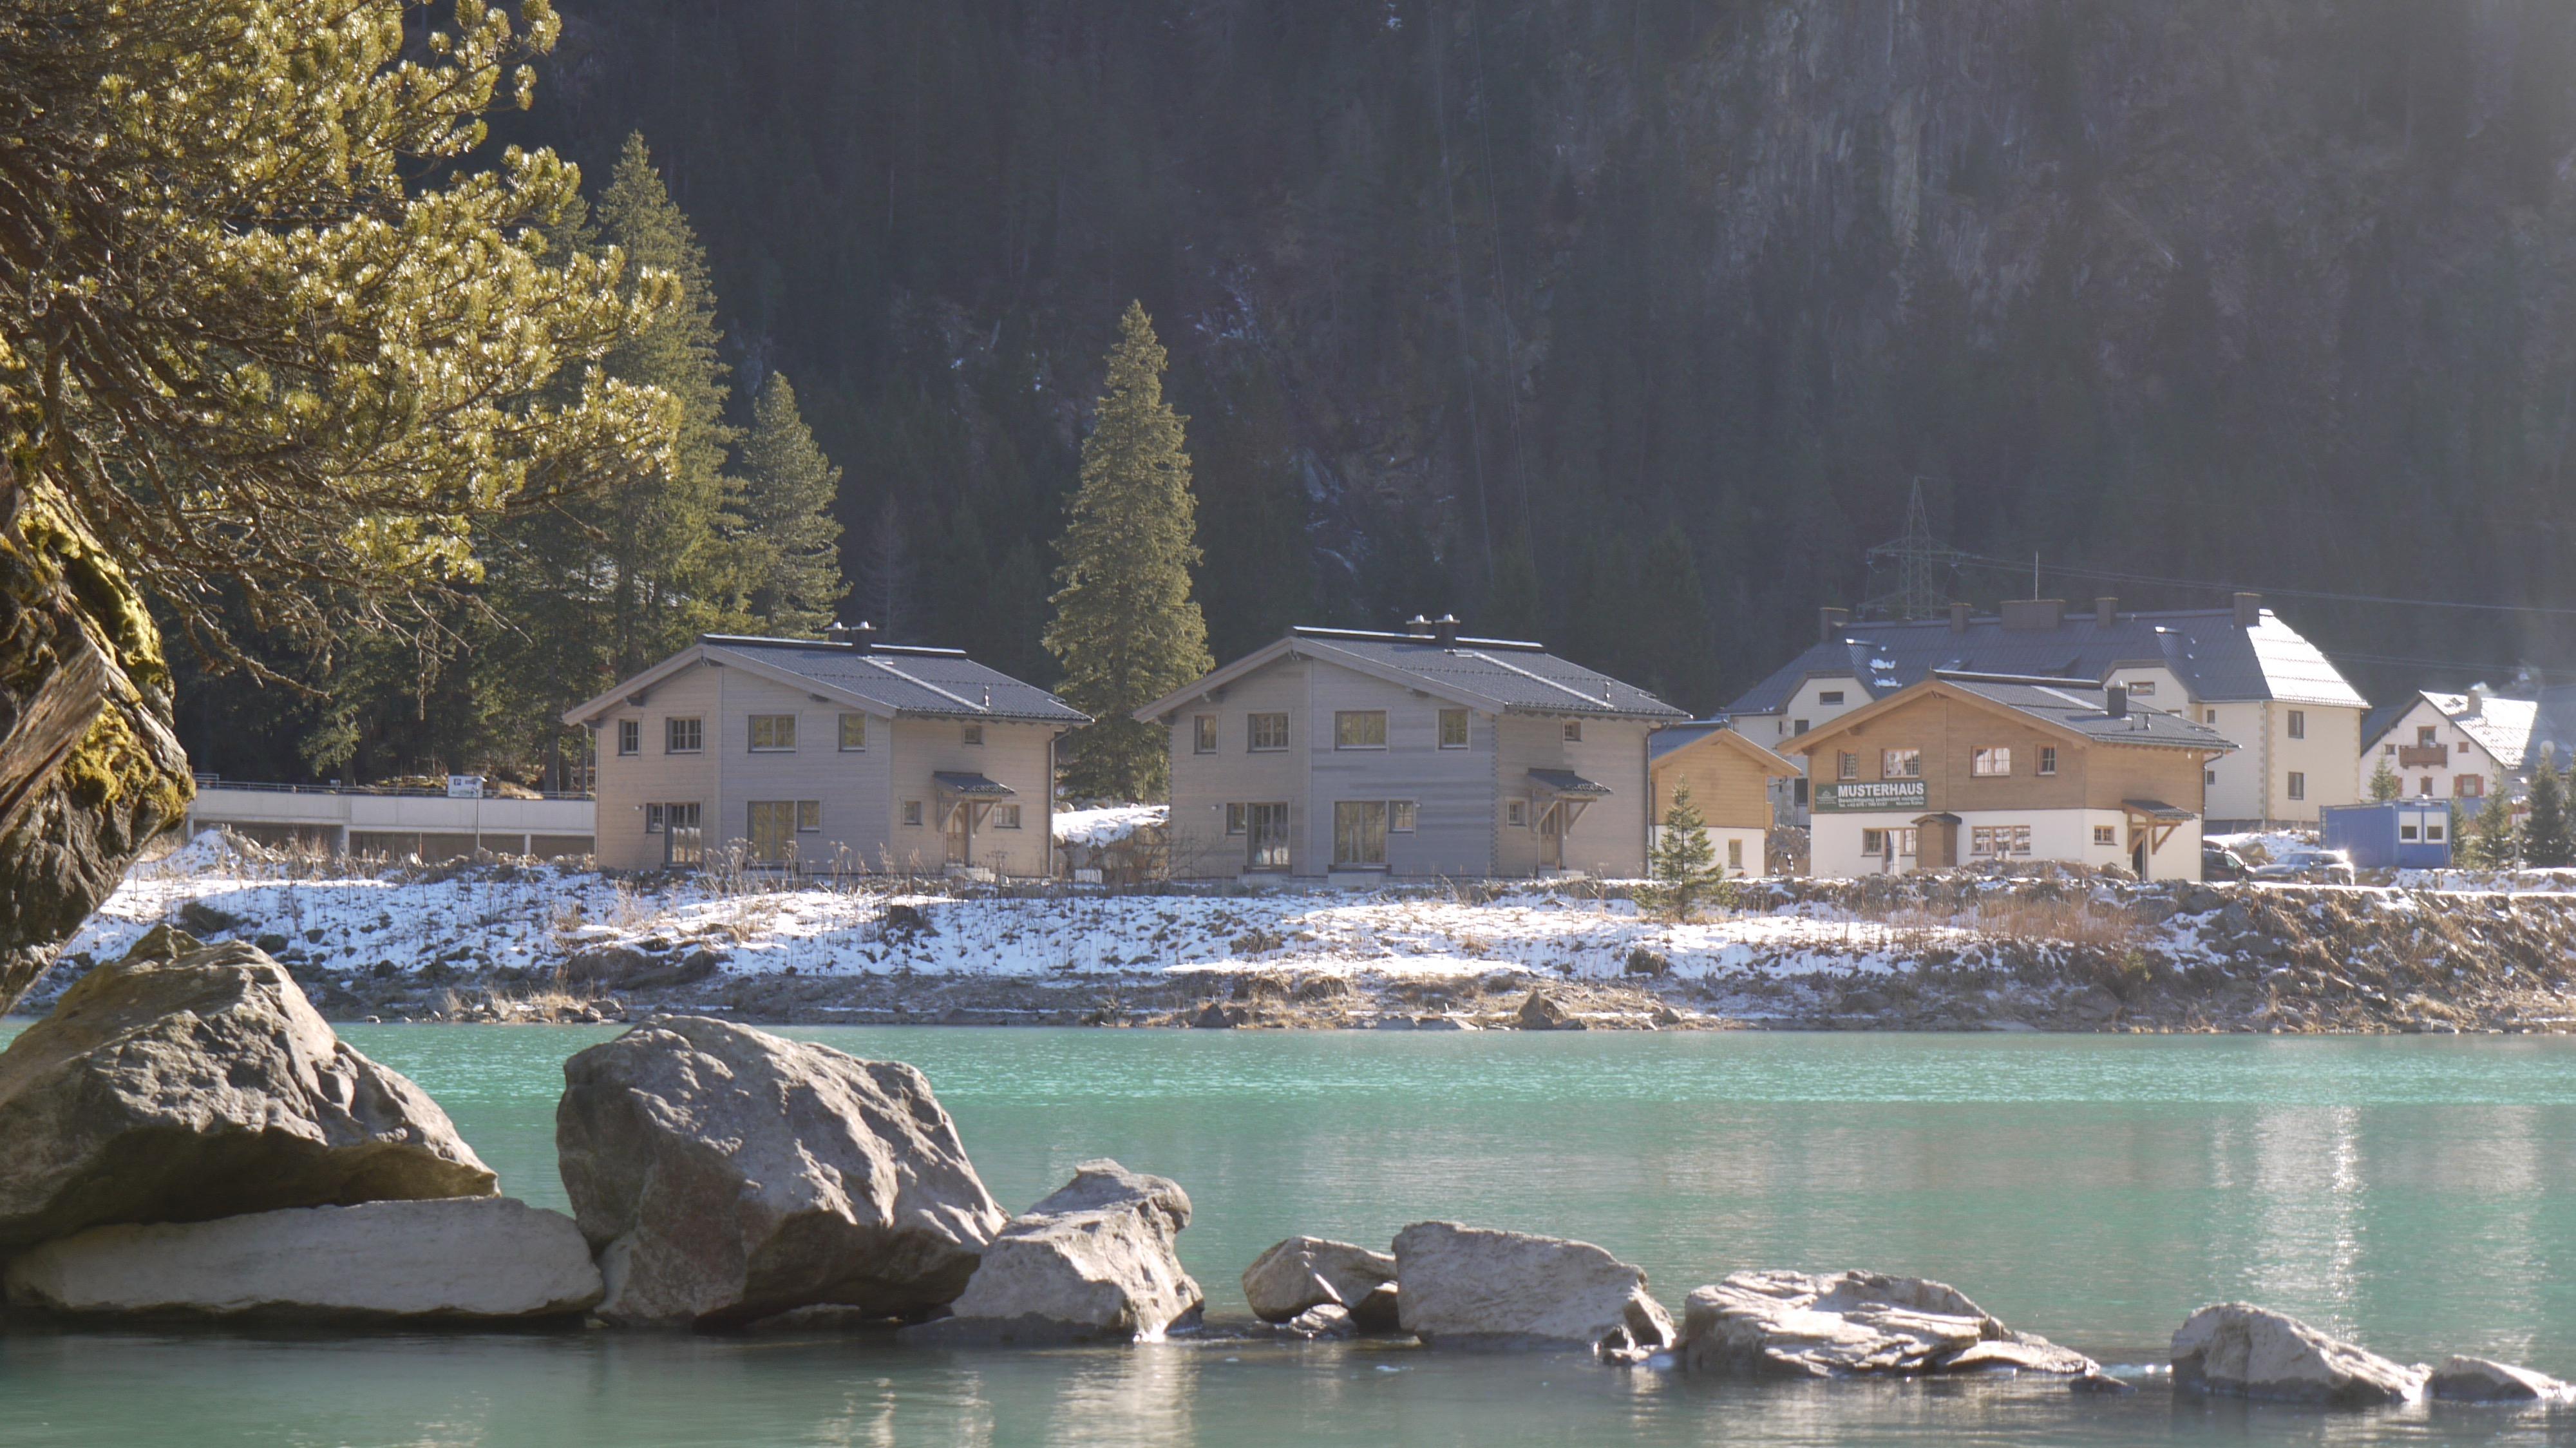 Maison de vacances Lodge Seeblick am Skilift und Bergsee für 5 (2636751), Uttendorf, Pinzgau, Salzbourg, Autriche, image 42